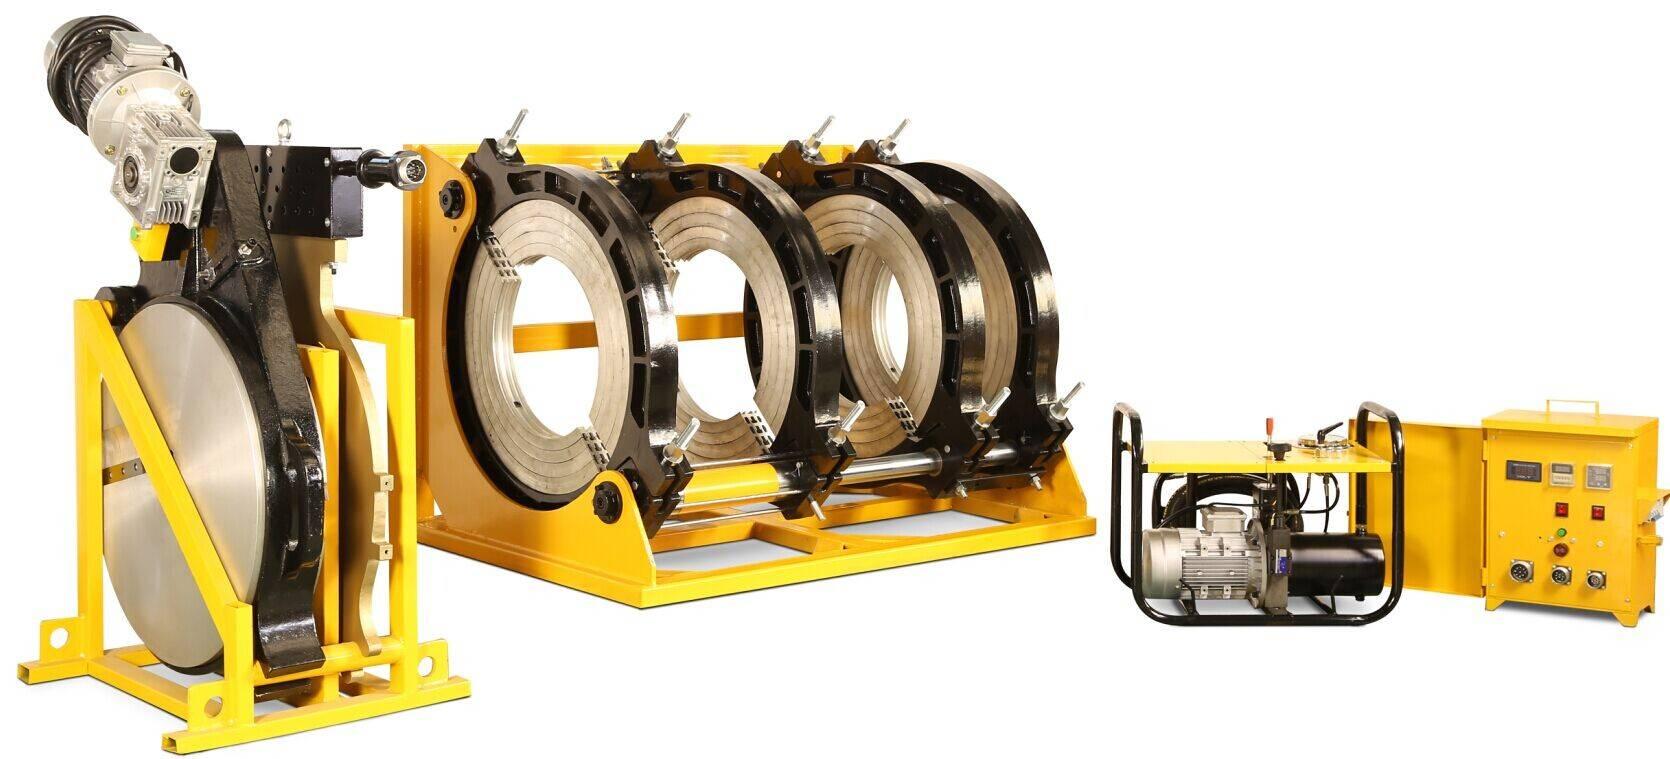 Hydraulic Butt Fusion Welding Machine Semi Automatic Welding-Basic Series